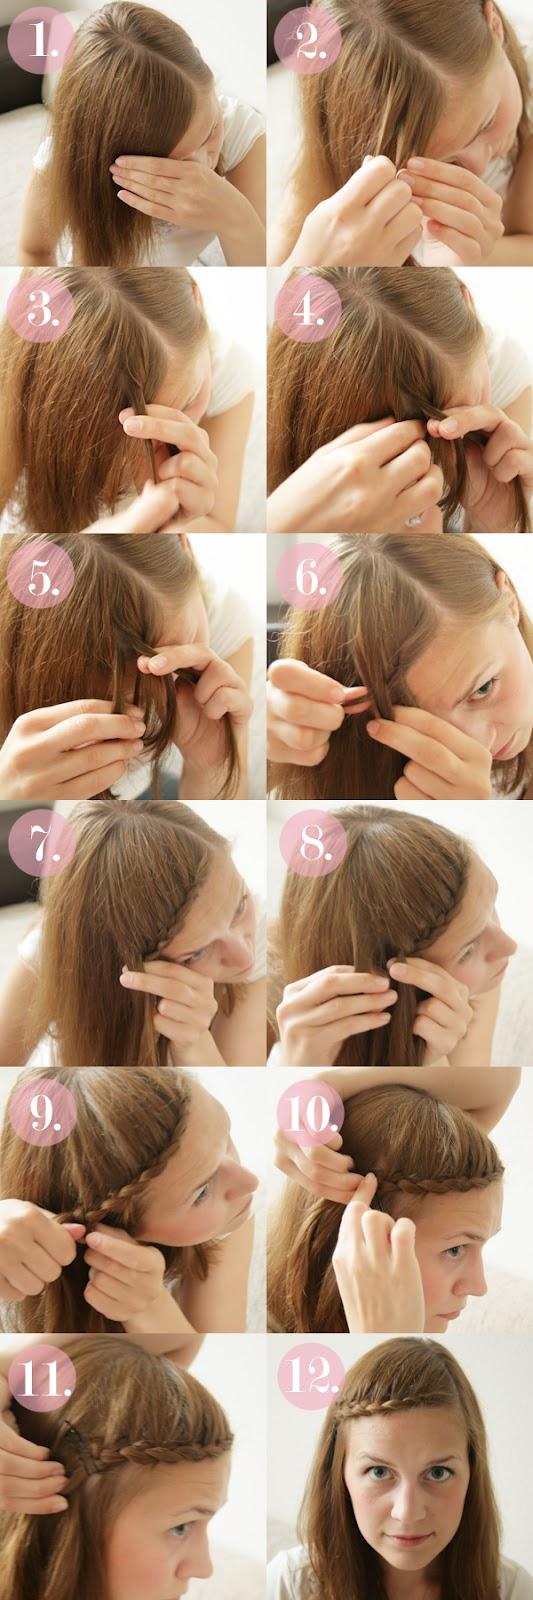 braided bangs vol 2 tutorial